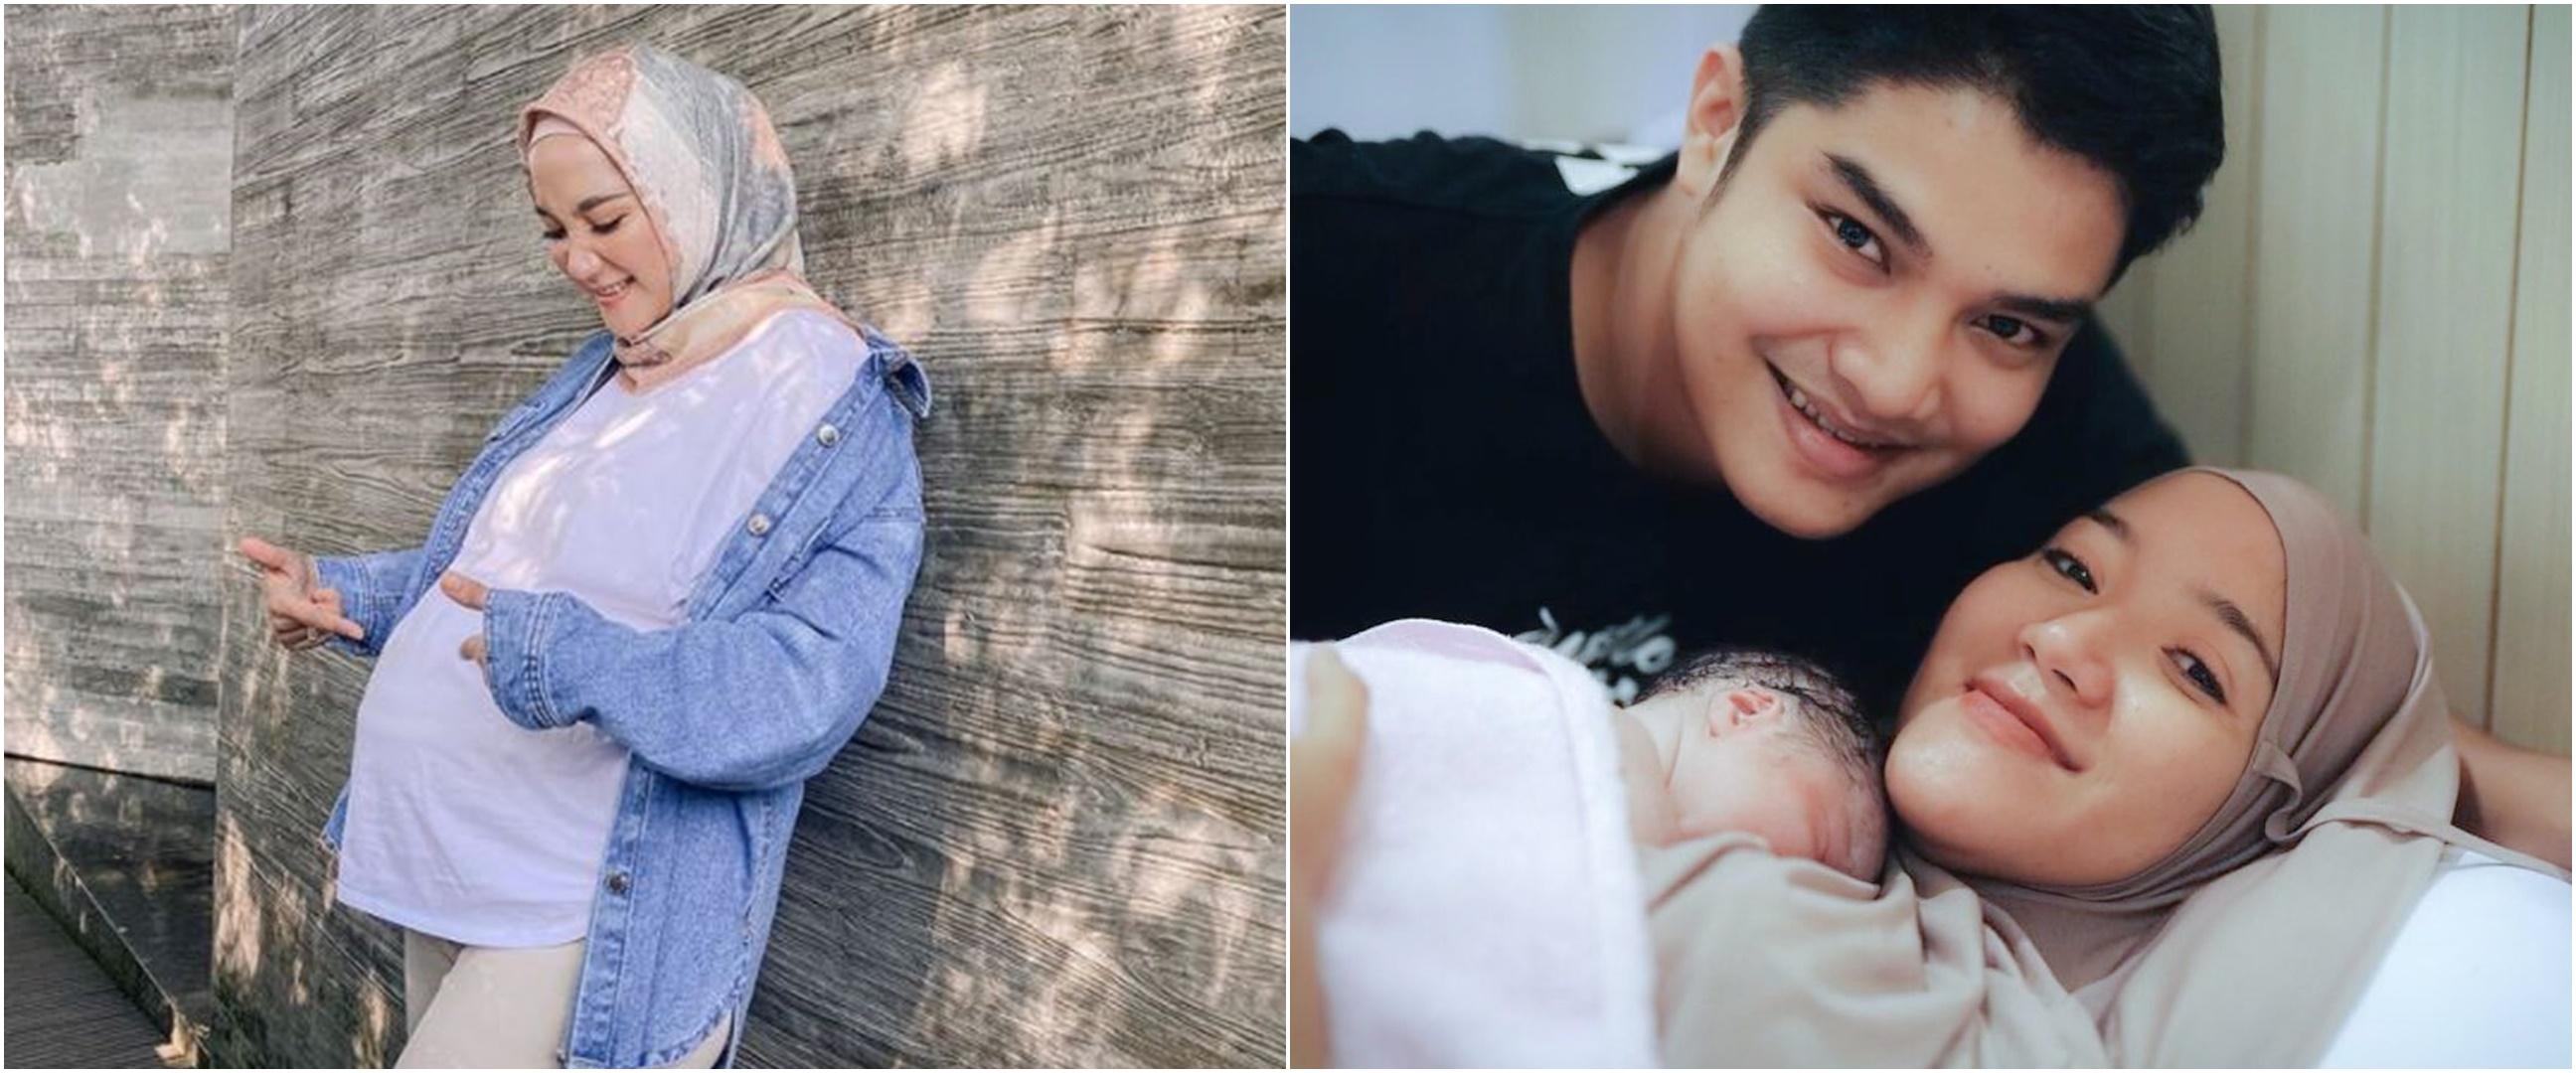 Momen Erica Putri kakak Citra Kirana melahirkan, ini nama anaknya